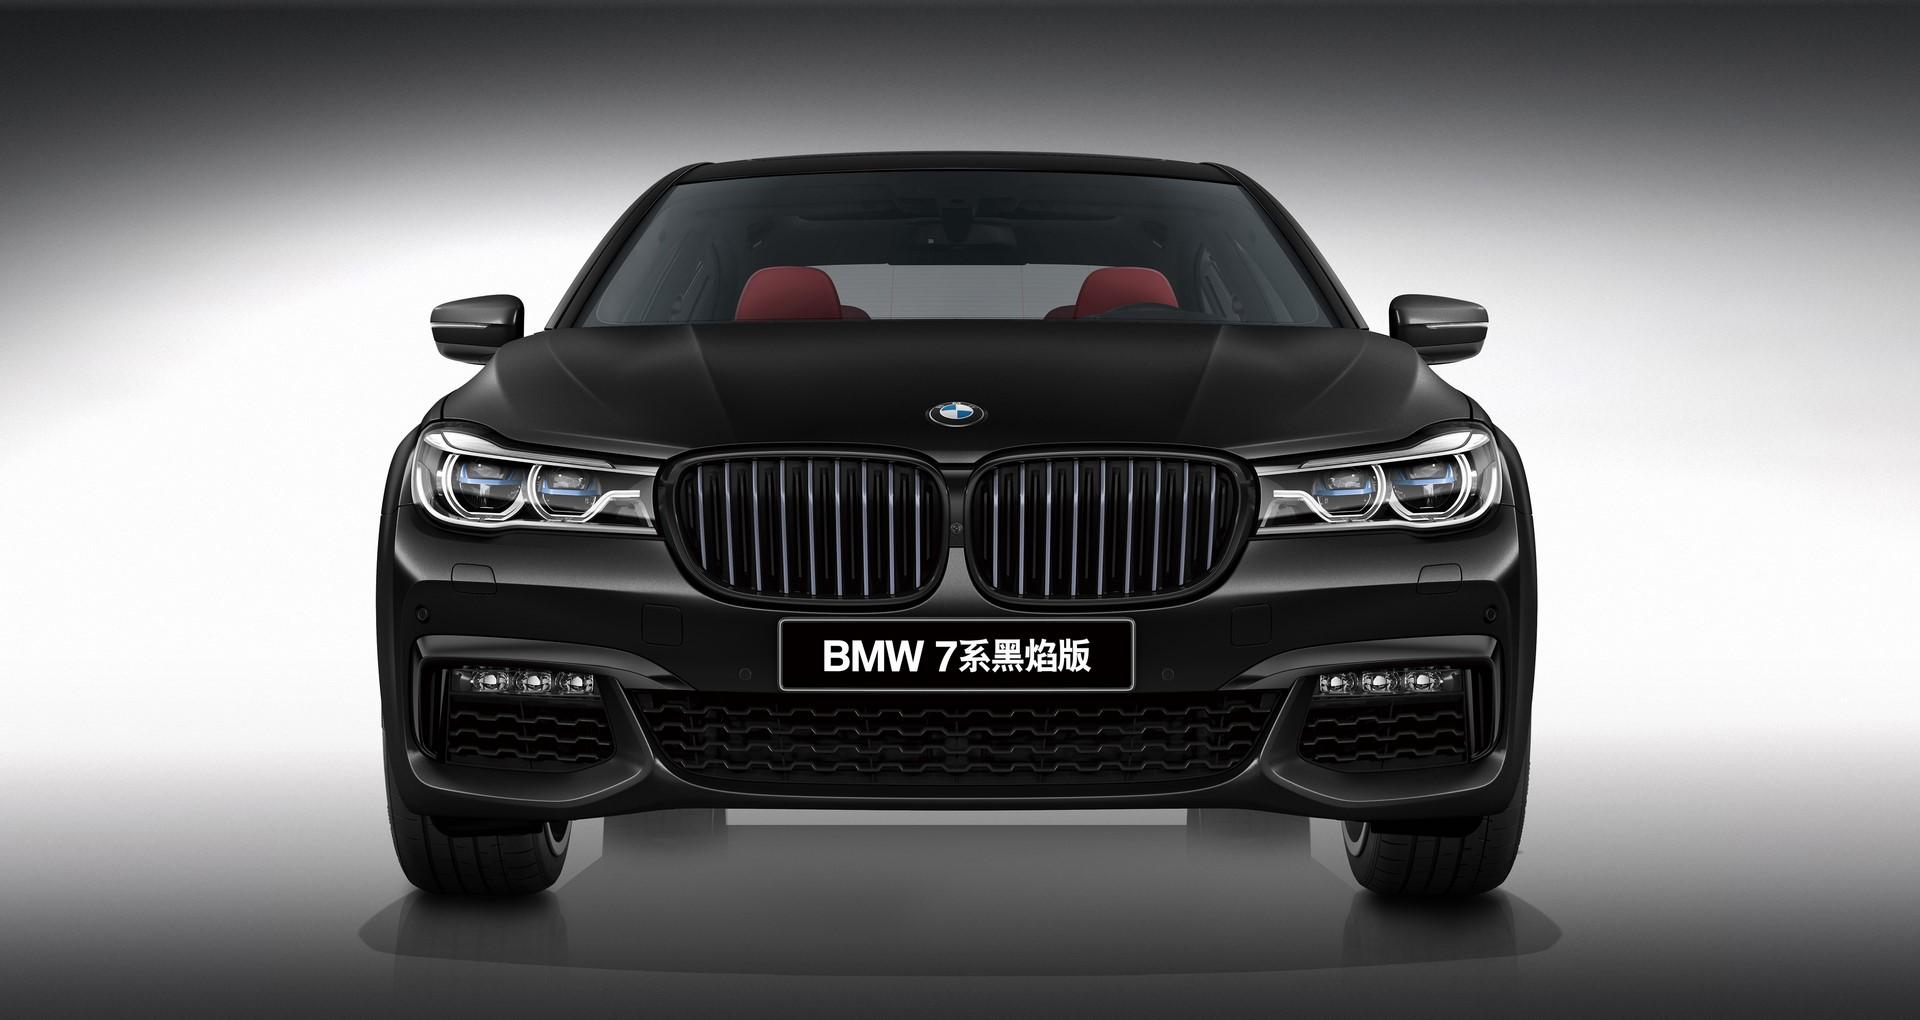 BMW 7-Series Black Fire Edition (2)